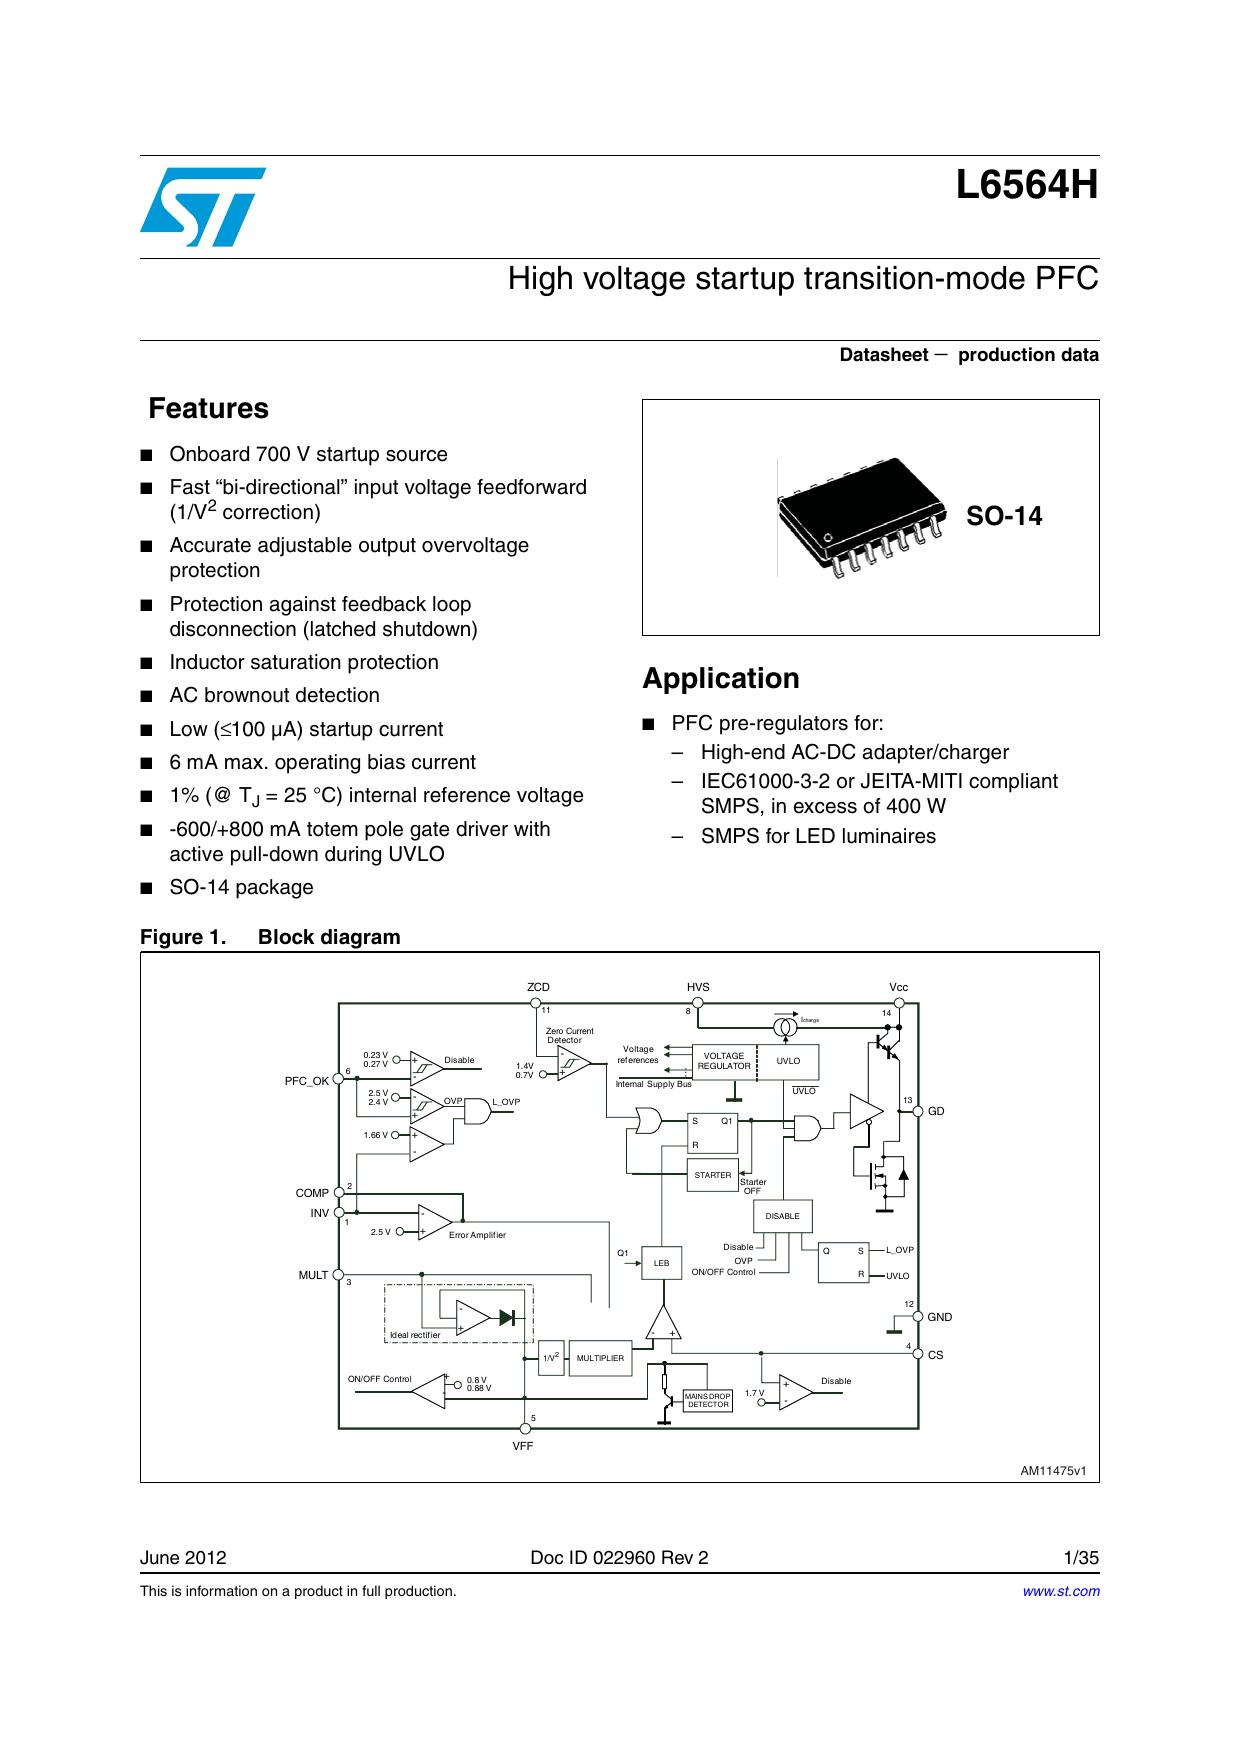 High voltage start-up transition-mode PFC | manualzz com